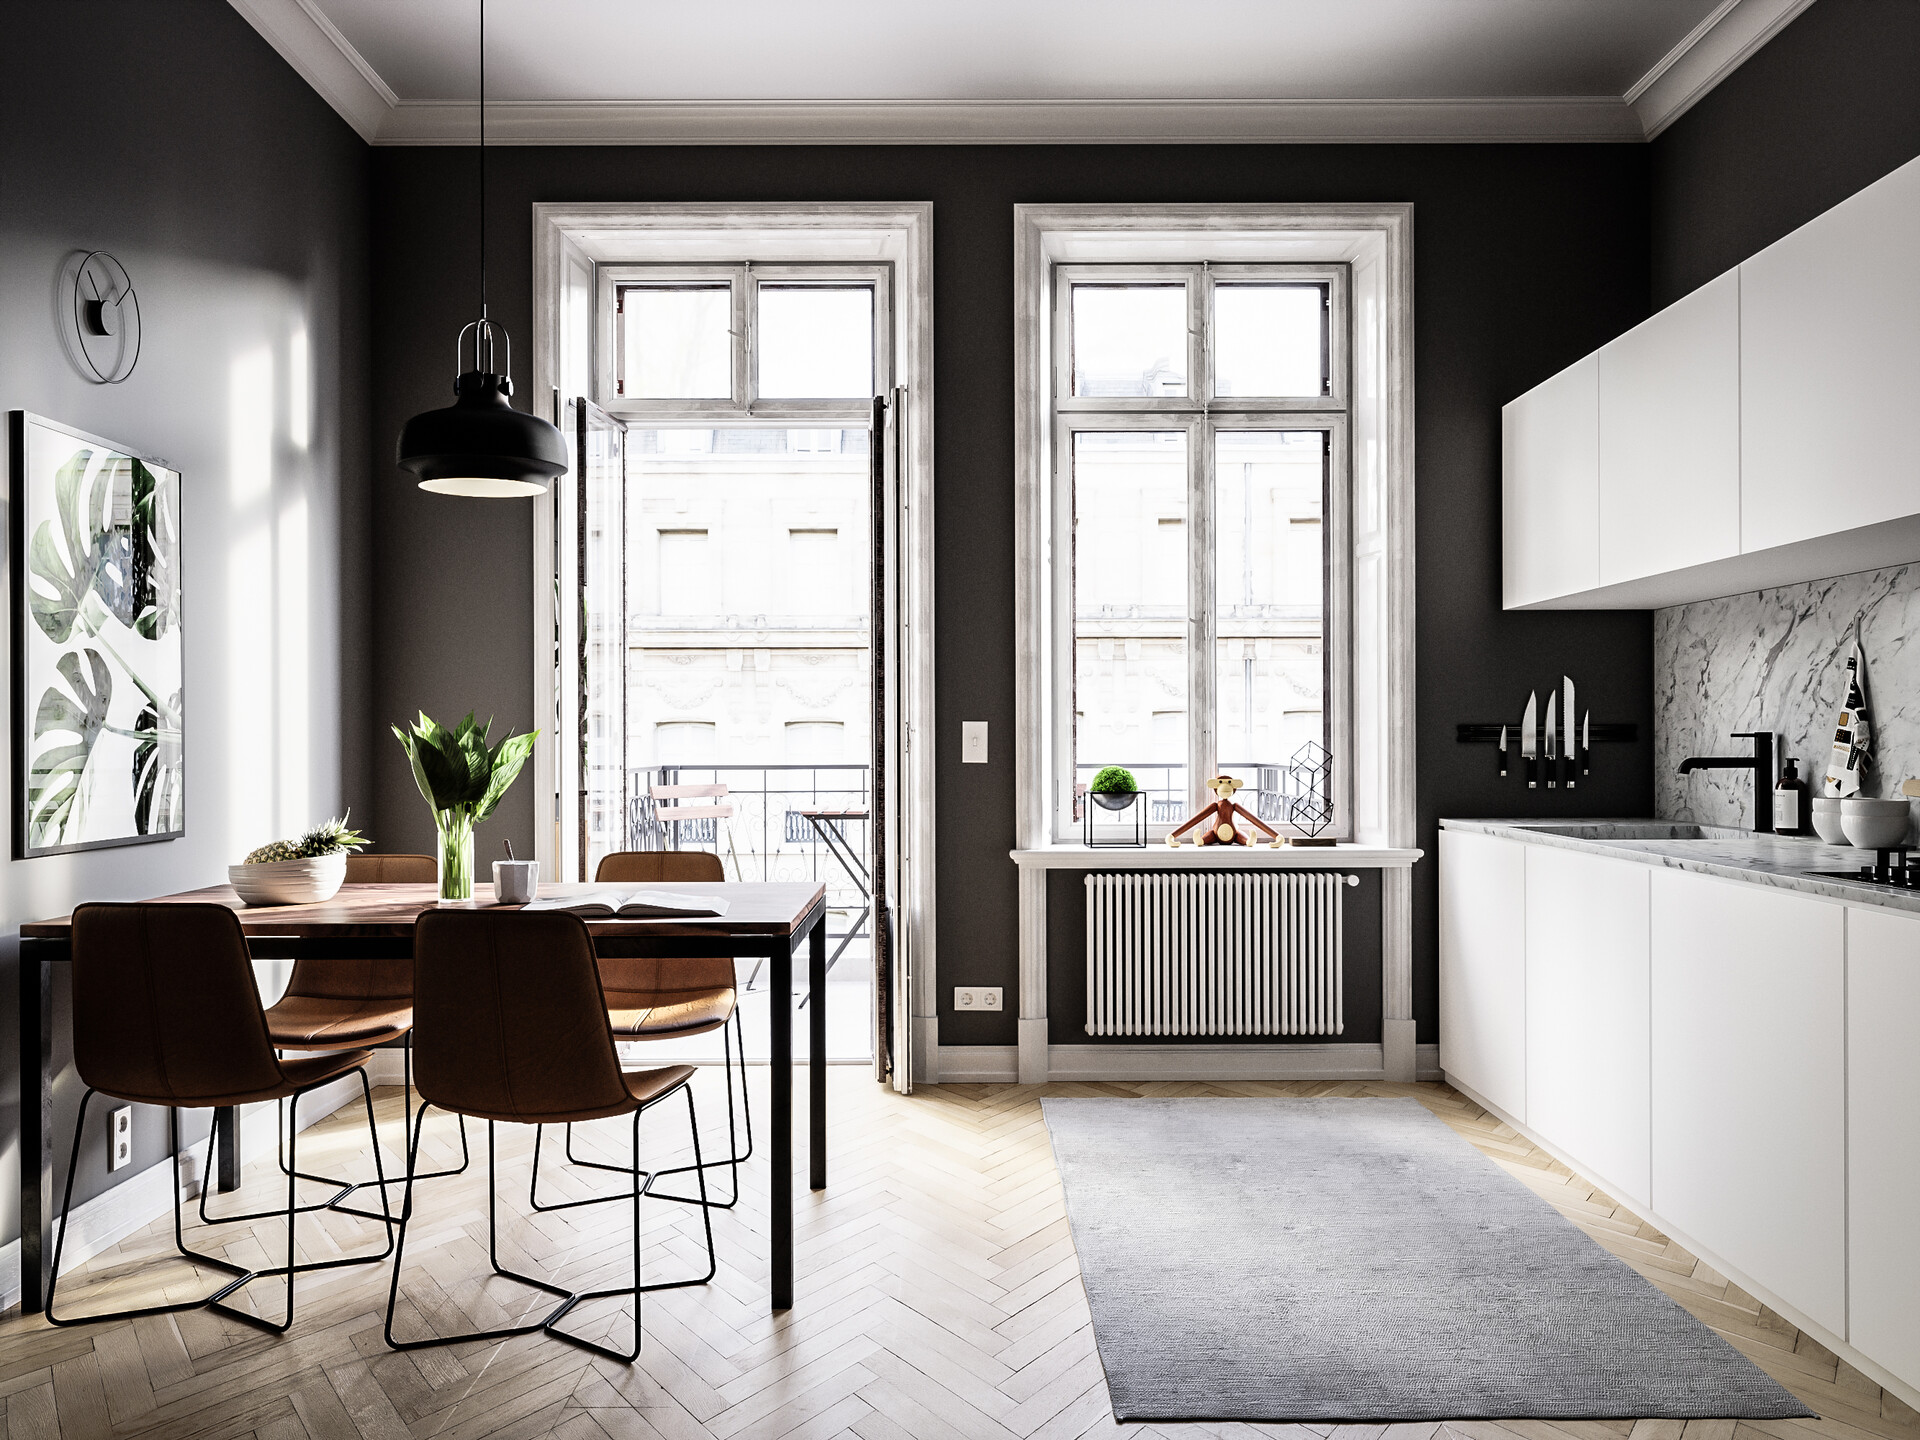 Minimalistic Nordic kitchen by   Bastian Hyldahl